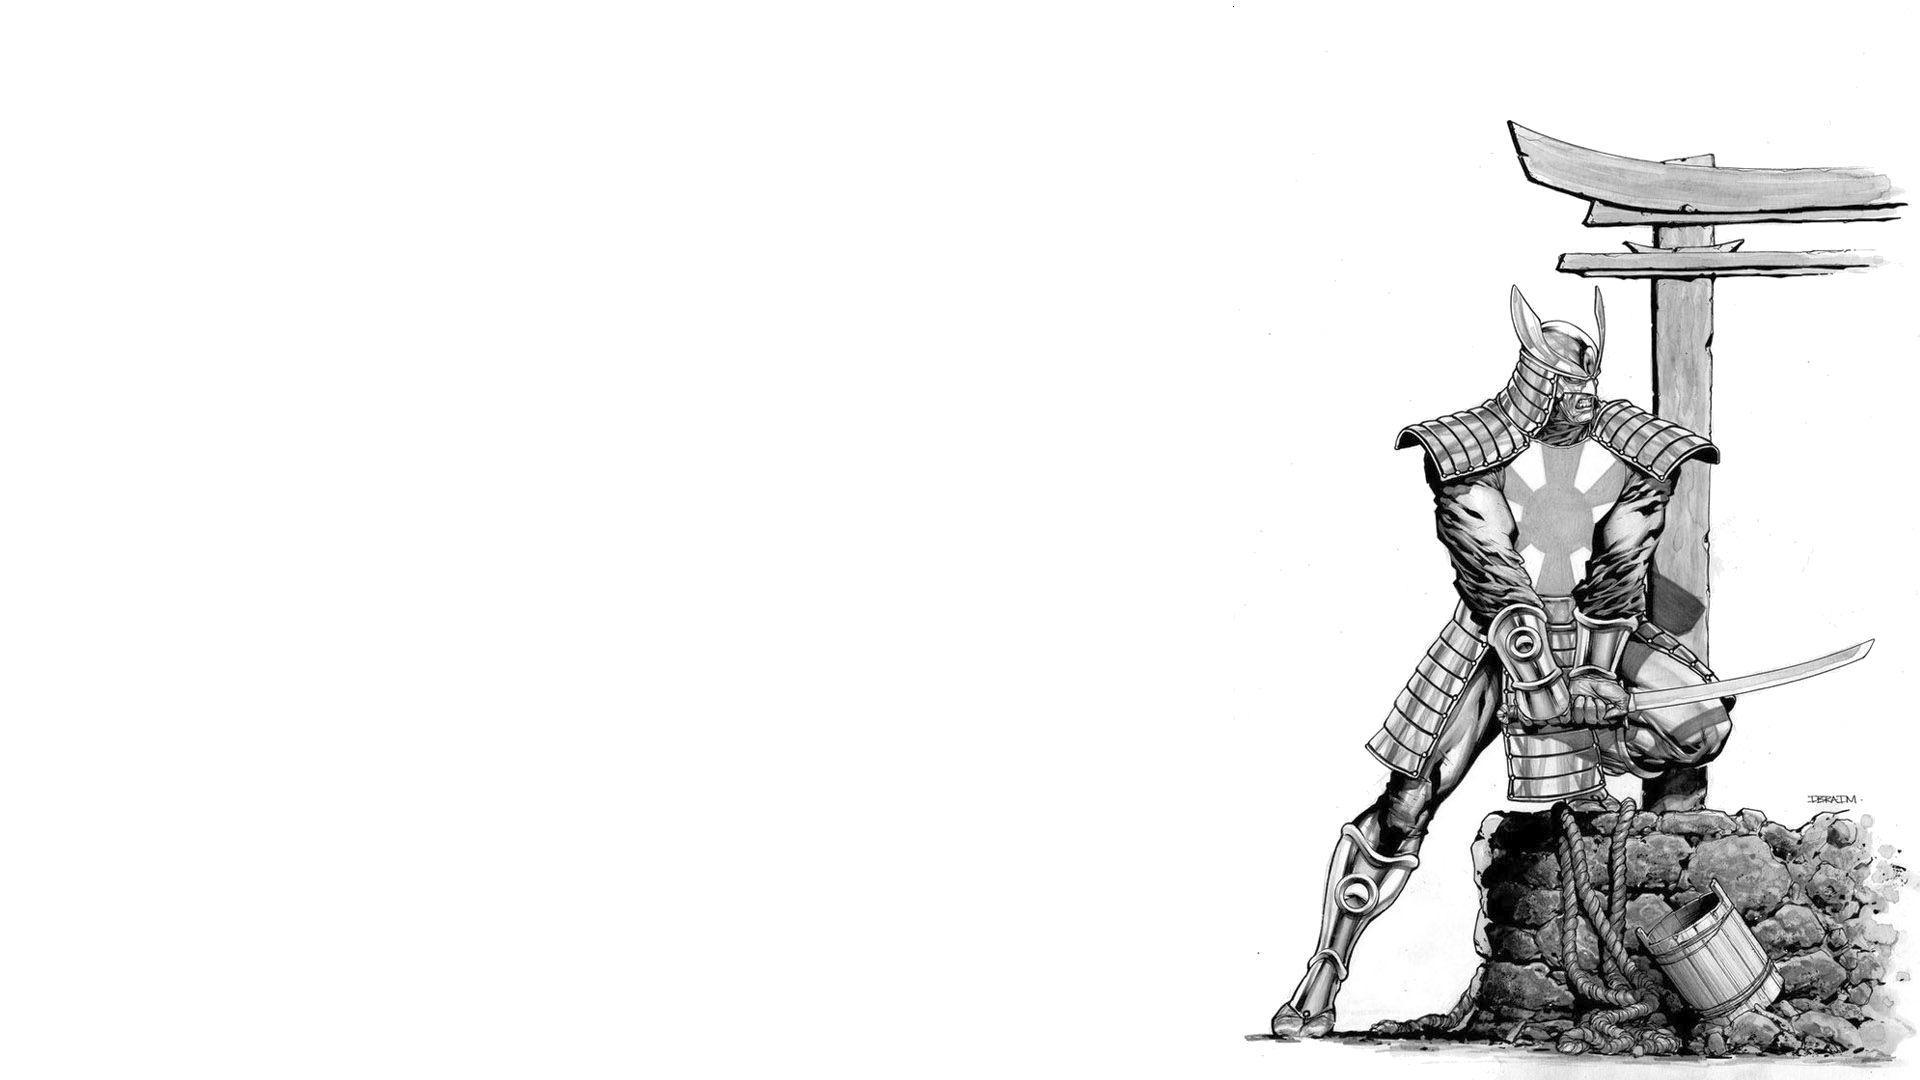 Silver Samurai Wallpapers Top Free Silver Samurai Backgrounds